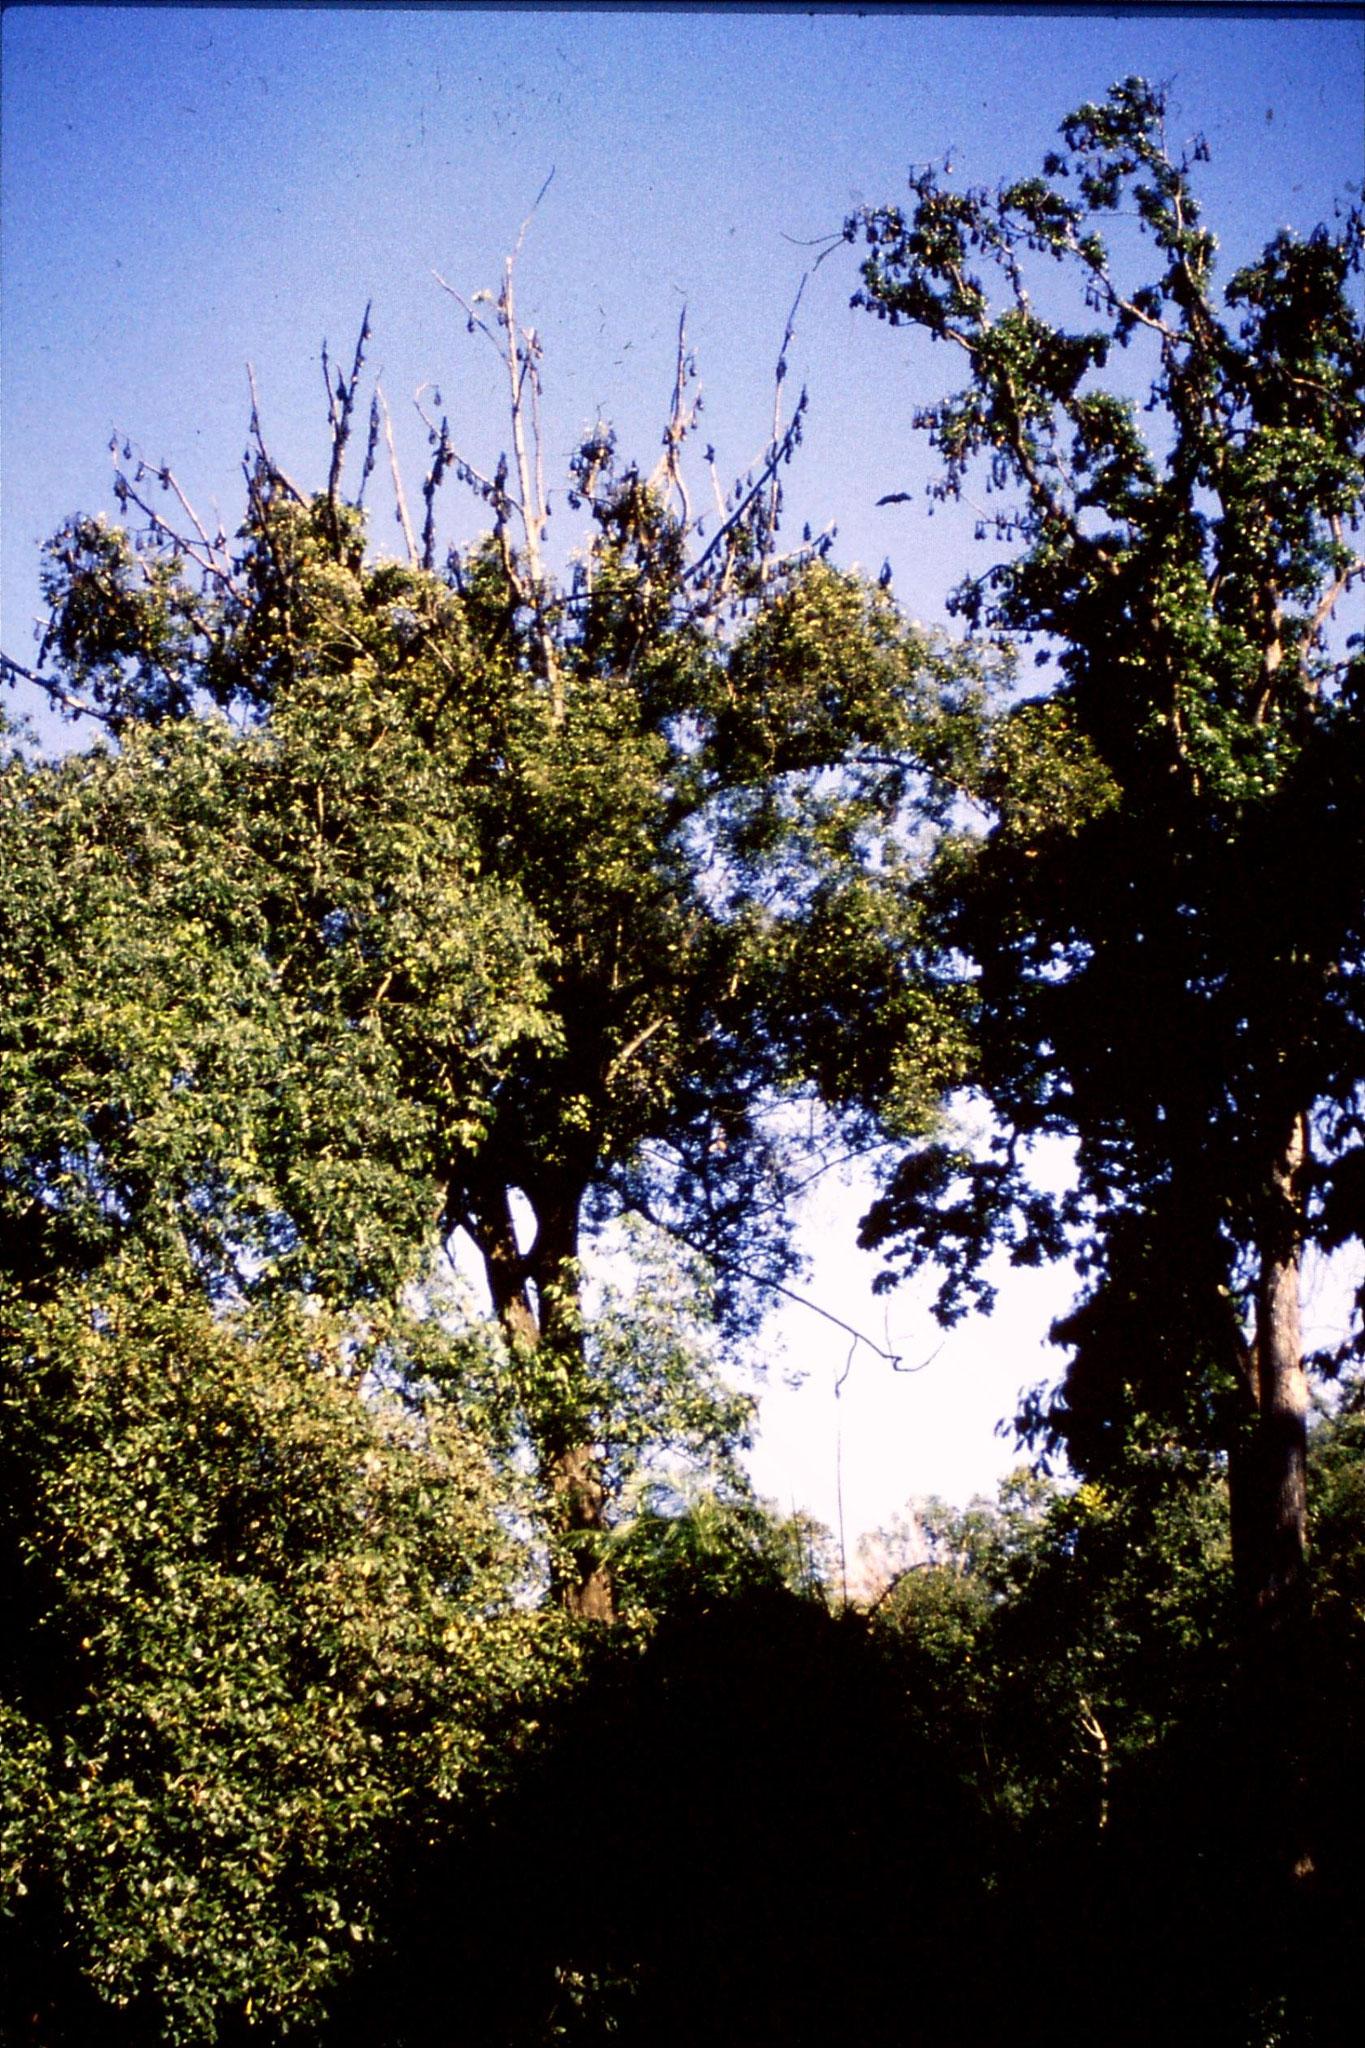 5/2/1990: 33: Kandy Botanic Gardens